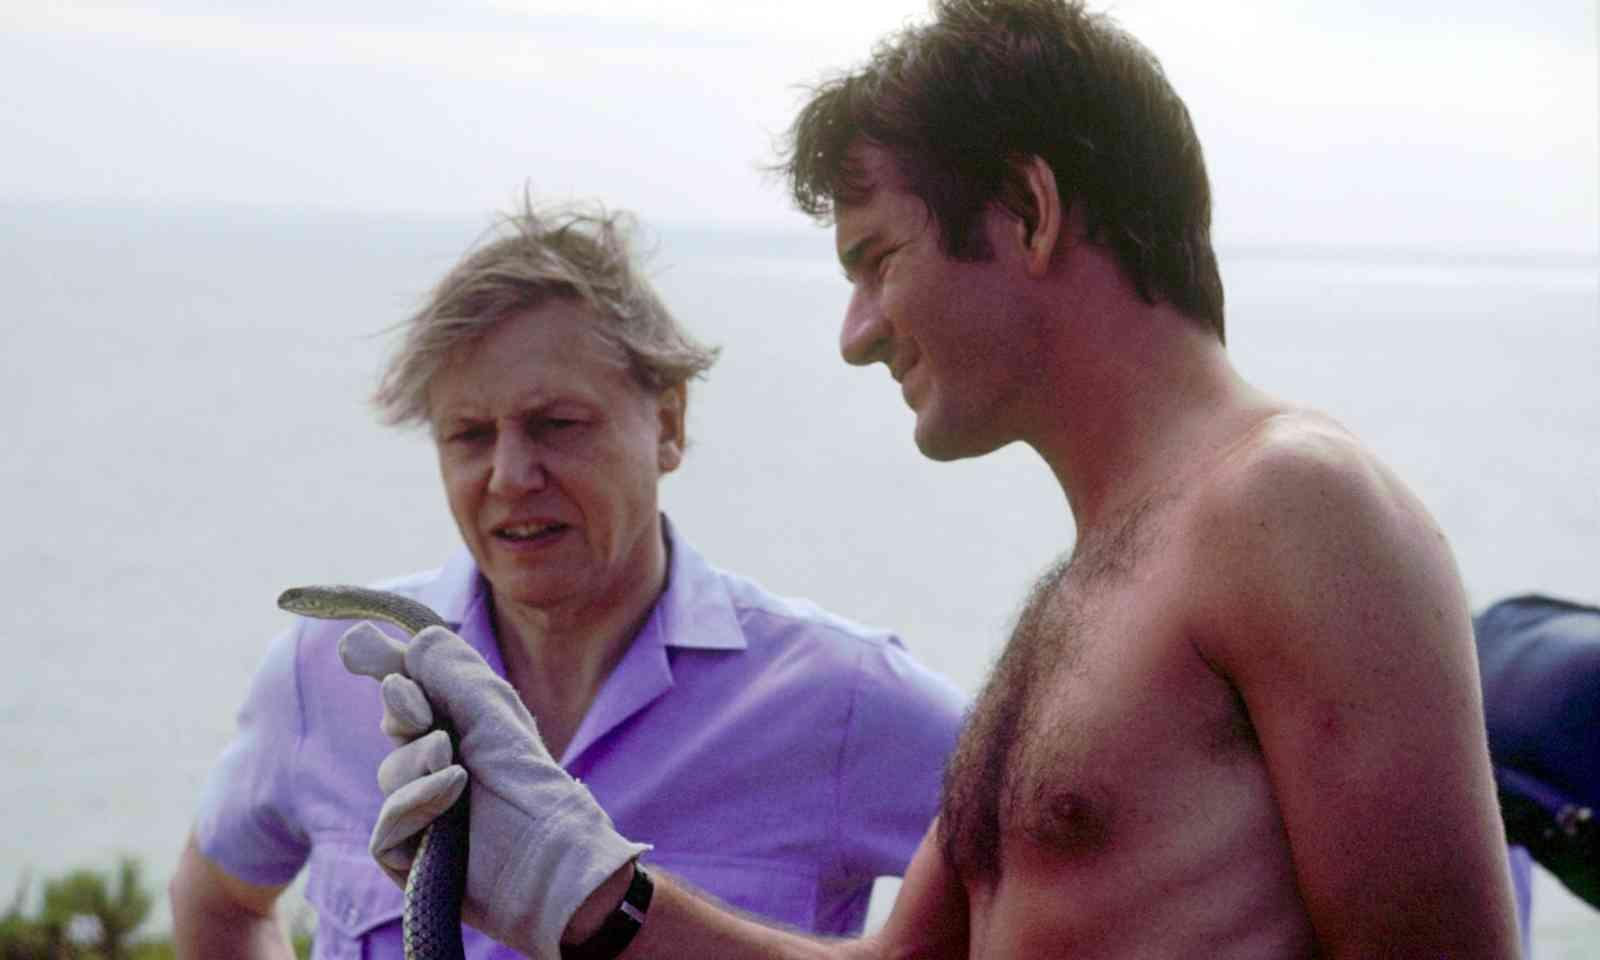 Filming with David Attenborough